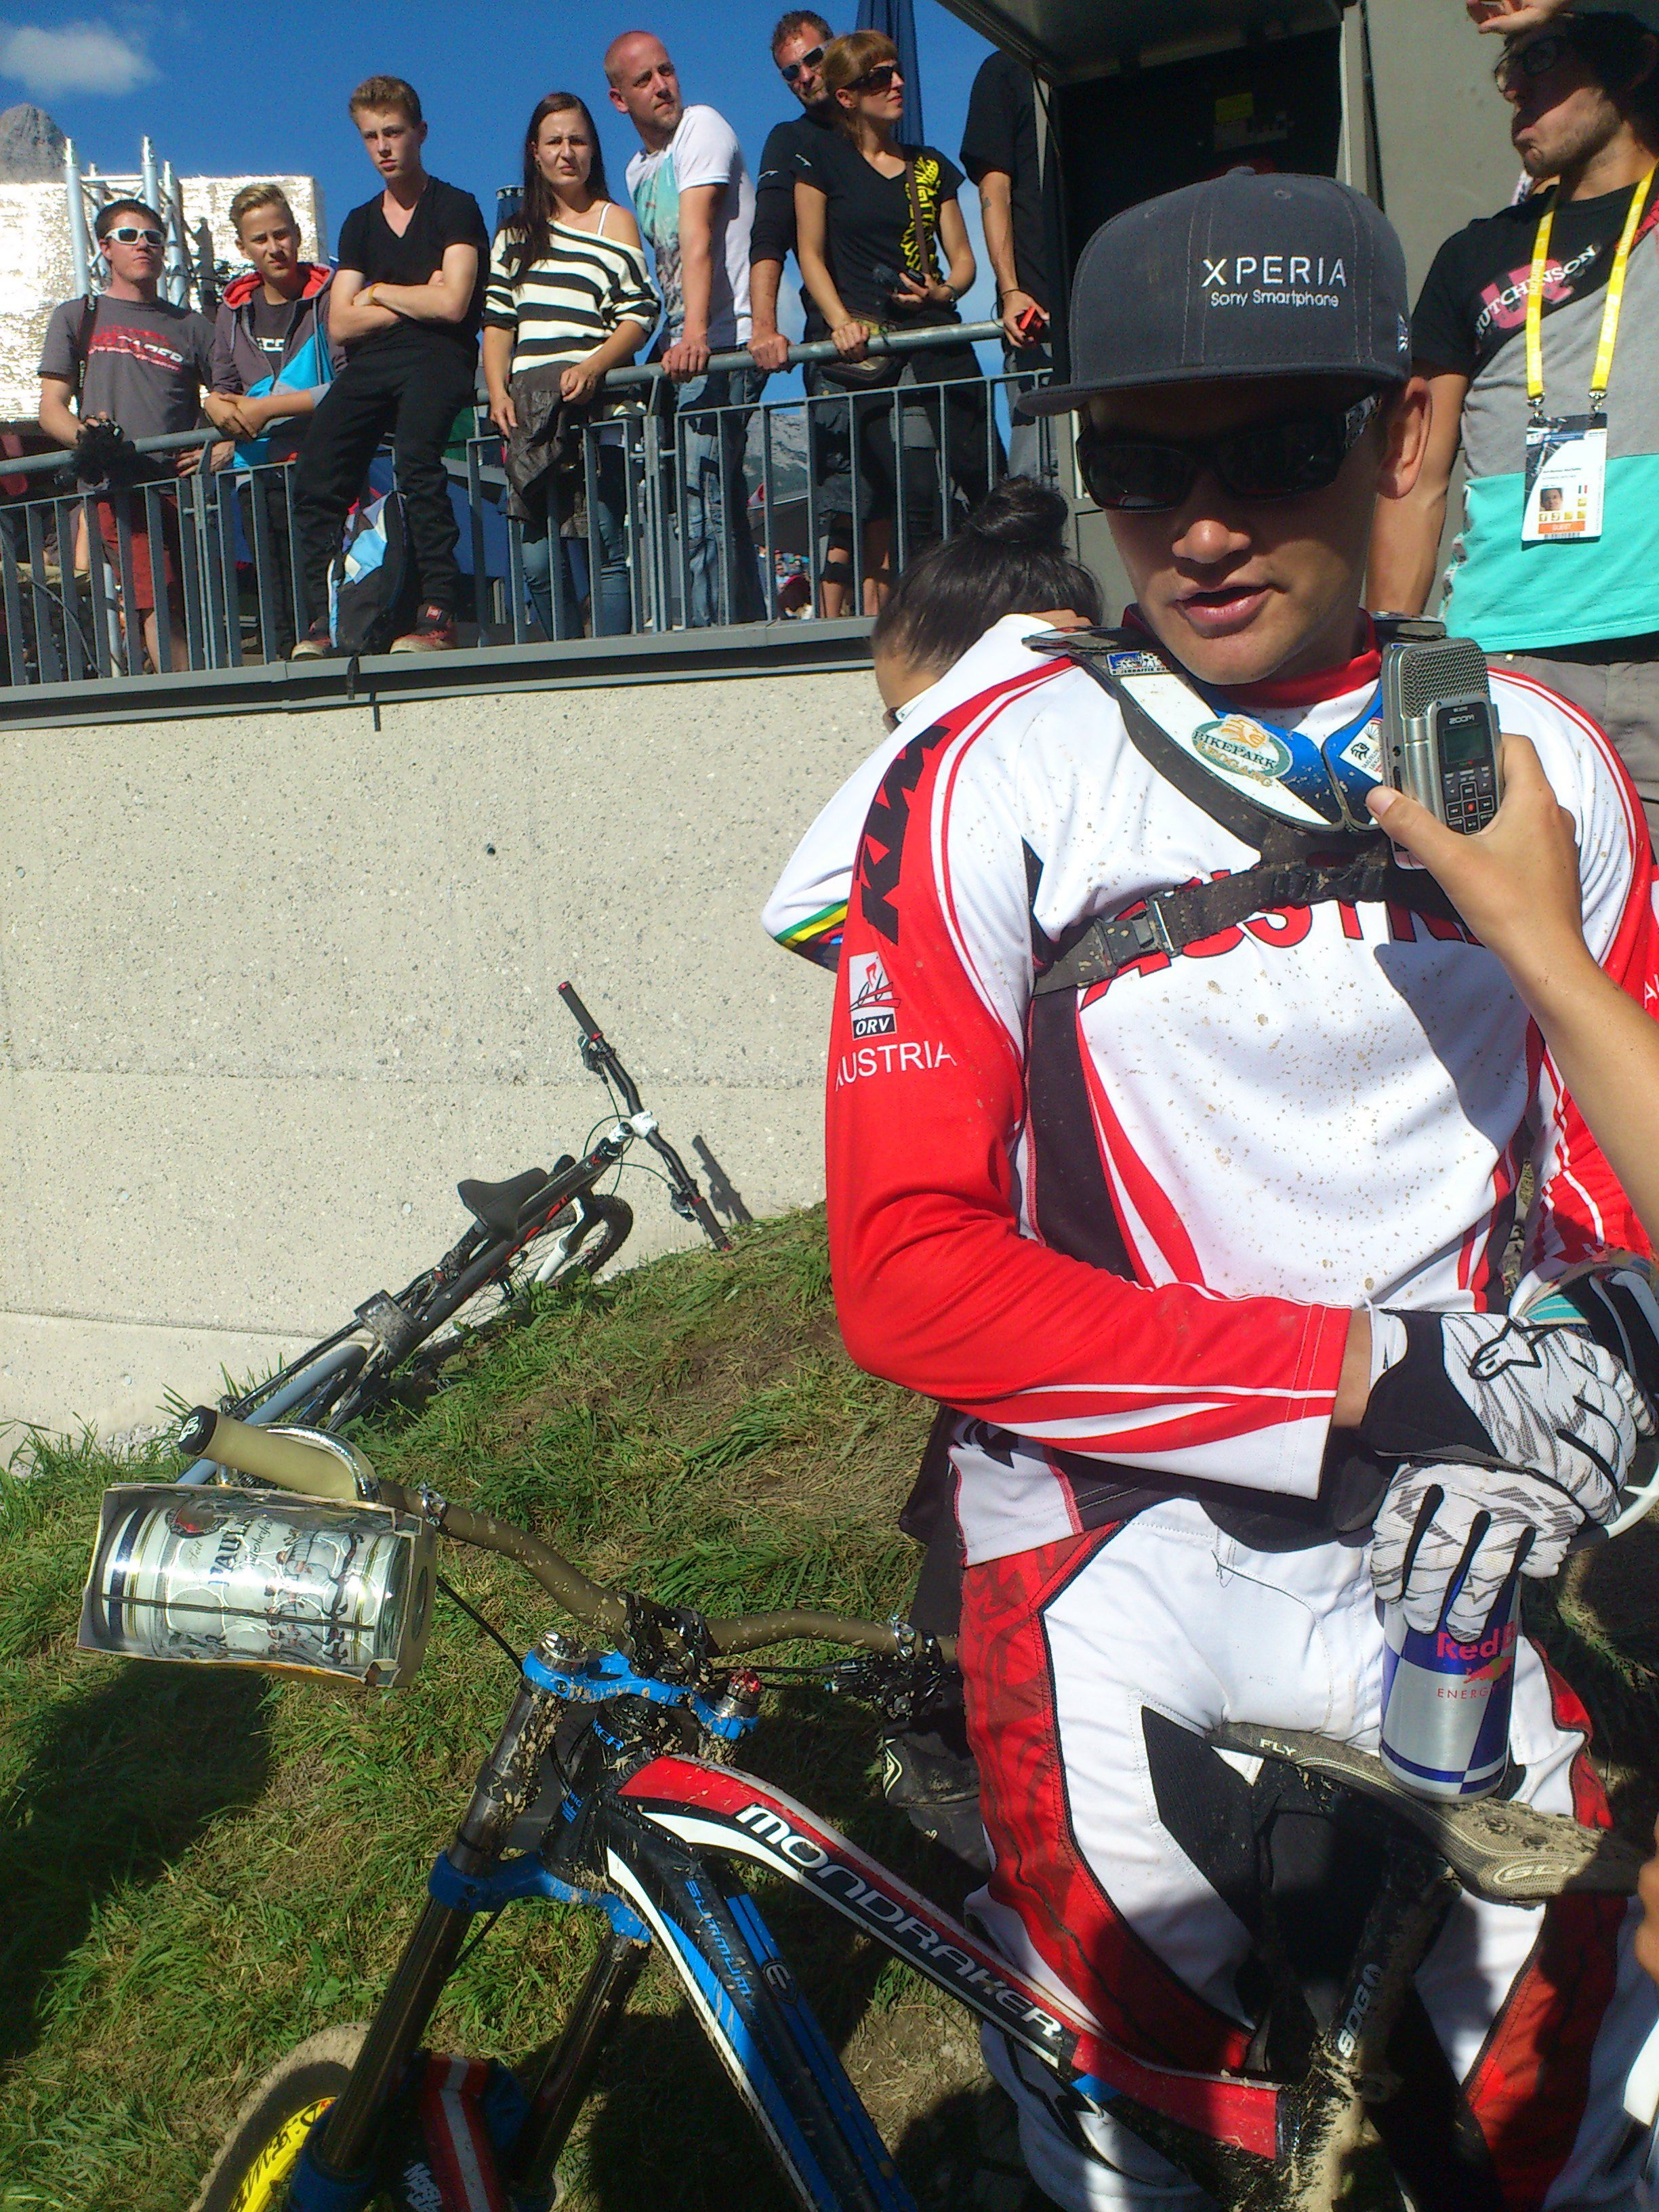 Markus Pekoll from Austria ranked Nr. 9 at UCI Downhill